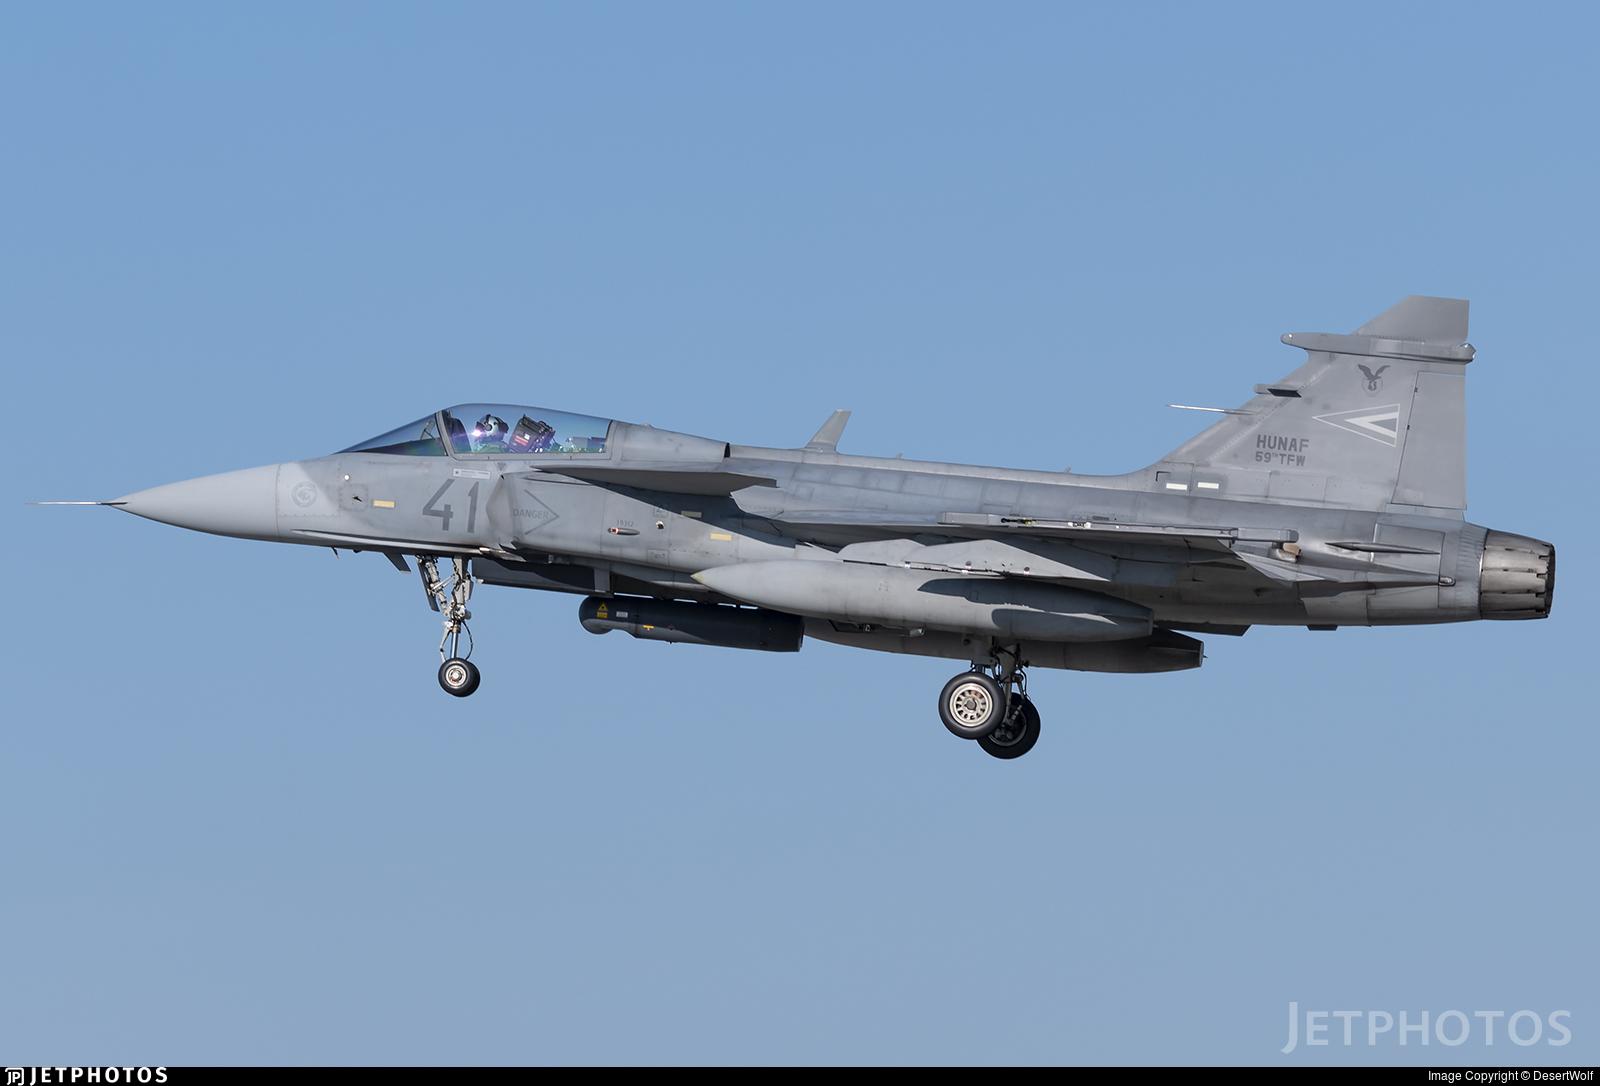 41 - Saab JAS-39C Gripen - Hungary - Air Force